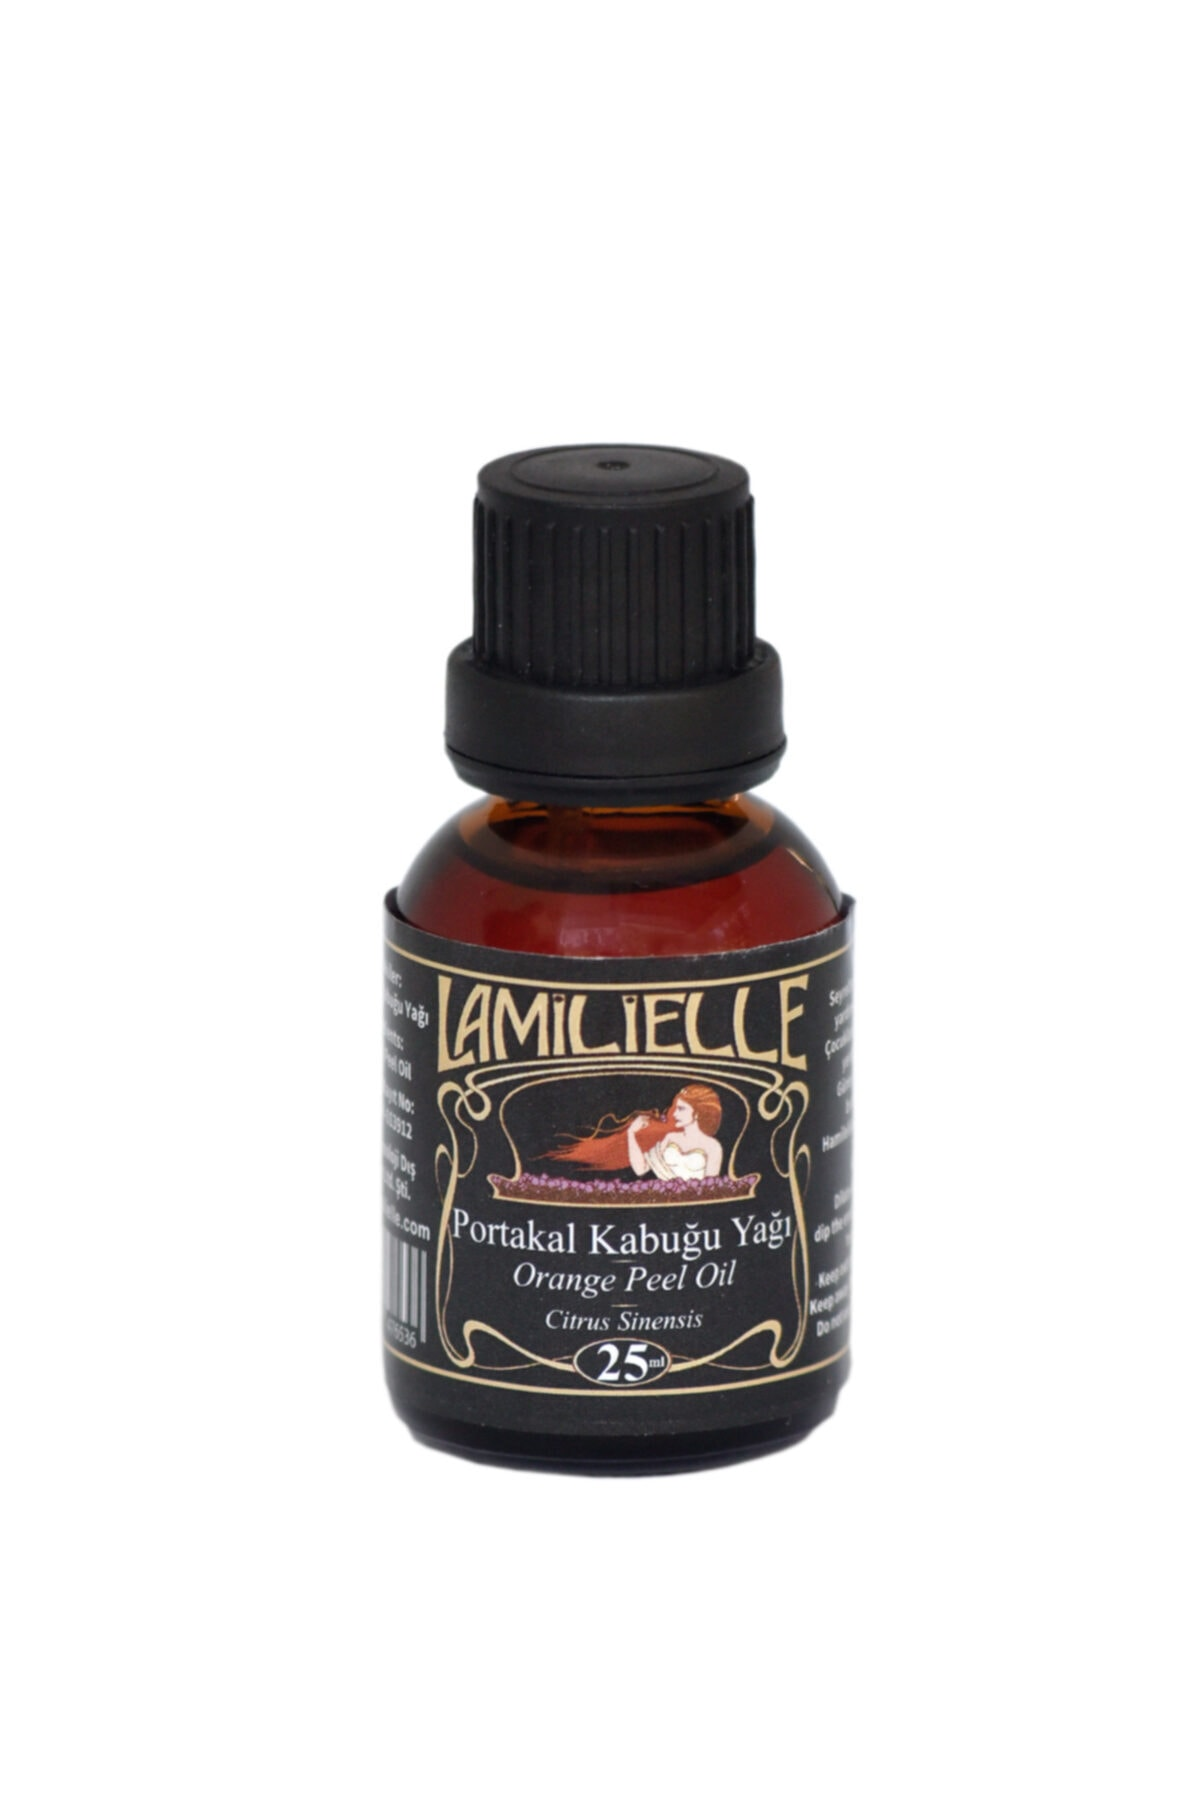 Lamilielle 25 Ml Portakal Kabuğu Yağı 1